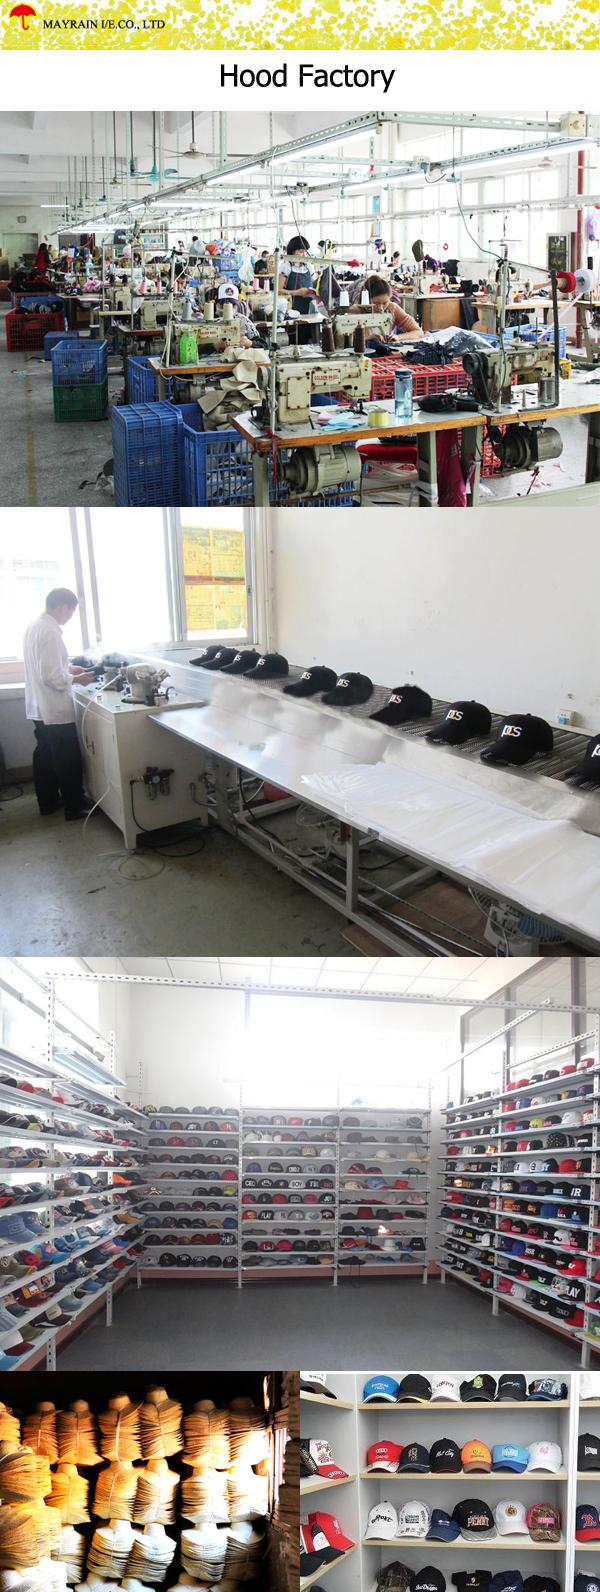 Hood Factory